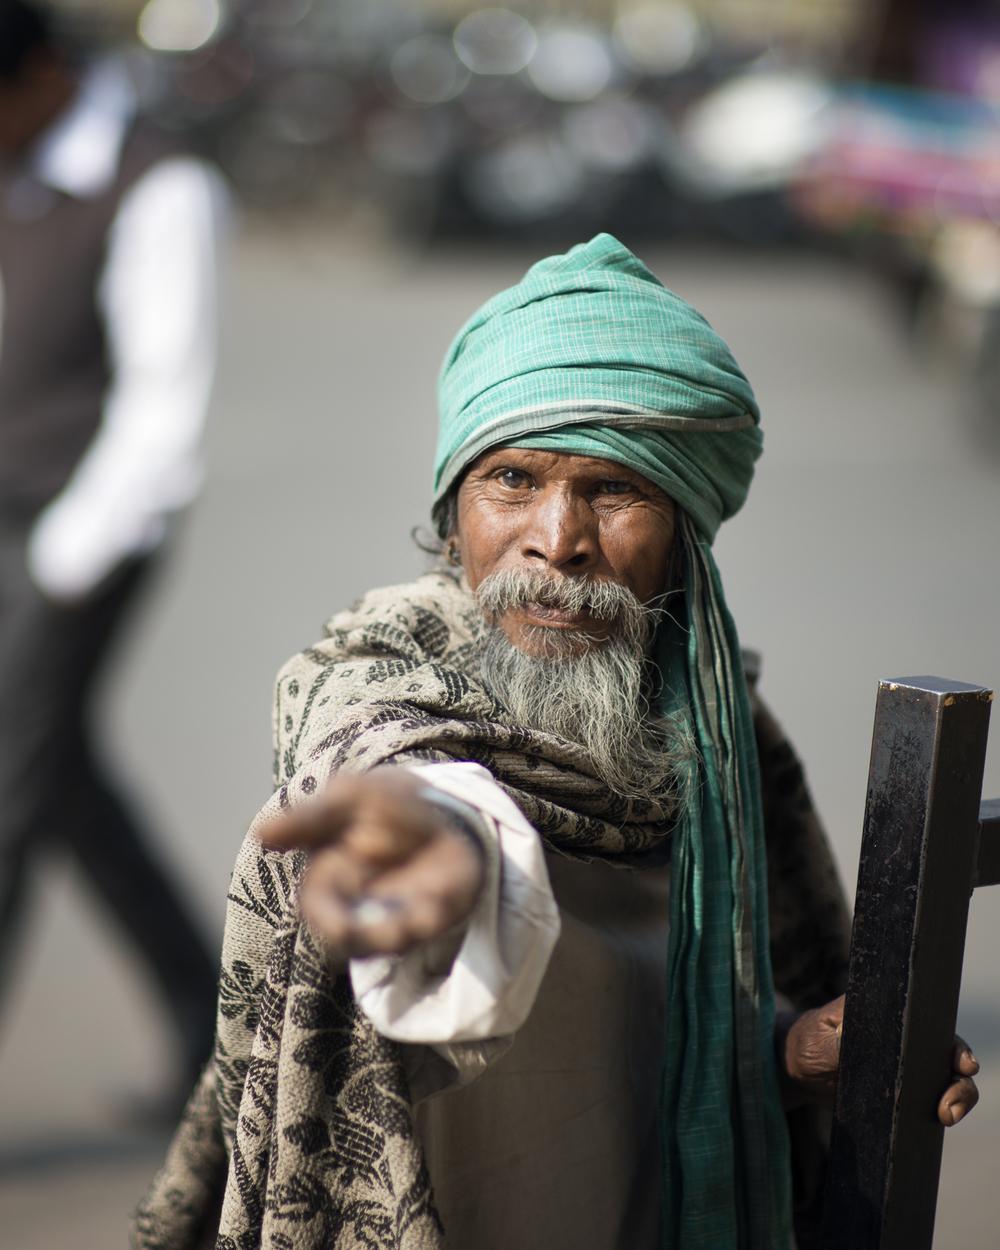 20151216 - India-5-2.jpg